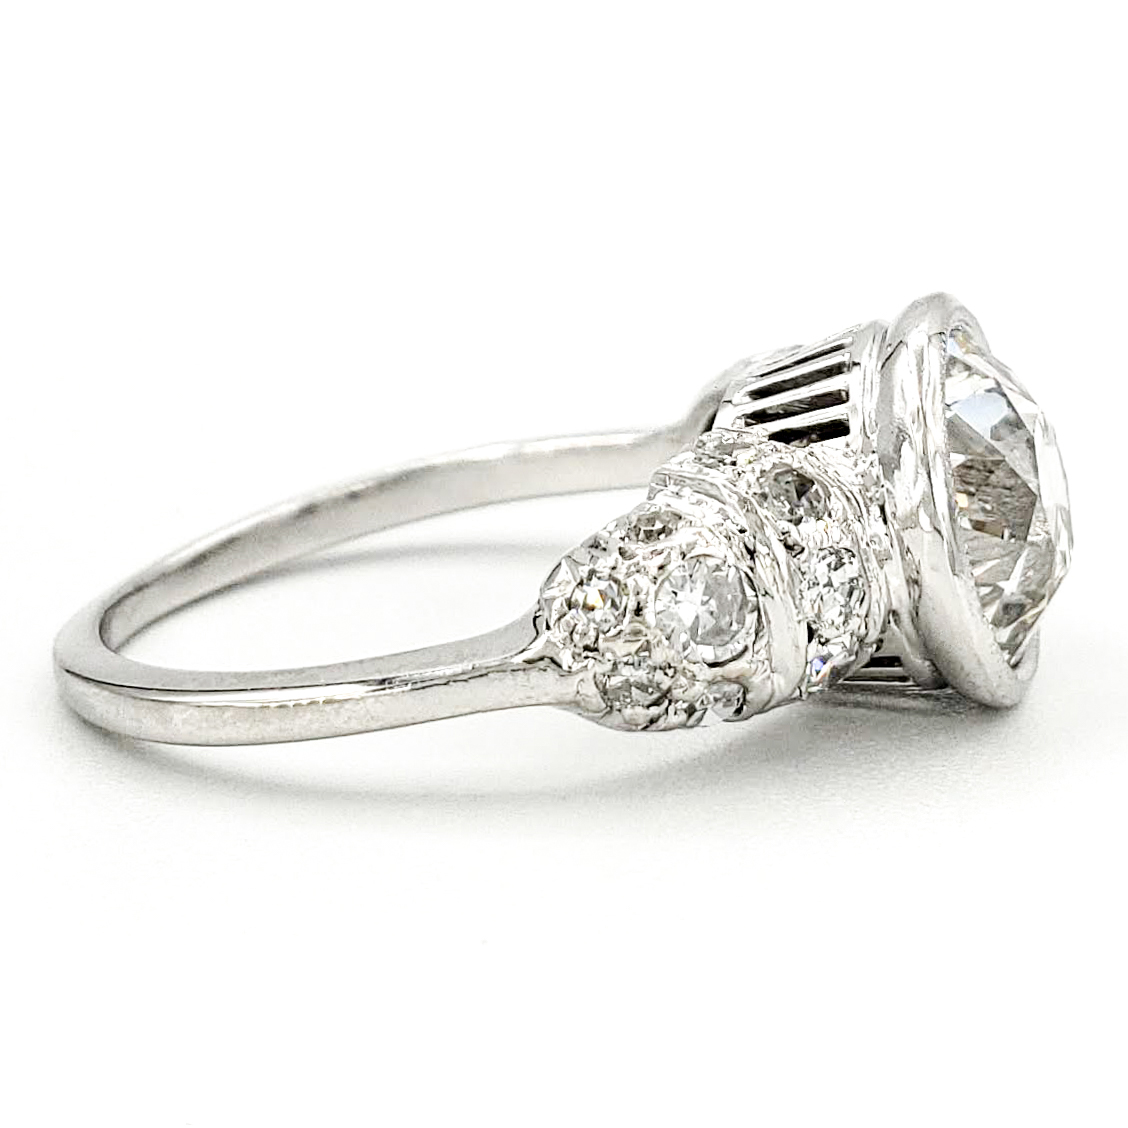 vintage-platinum-engagement-ring-with-1-85-carat-old-european-cut-diamond-egl-h-si1